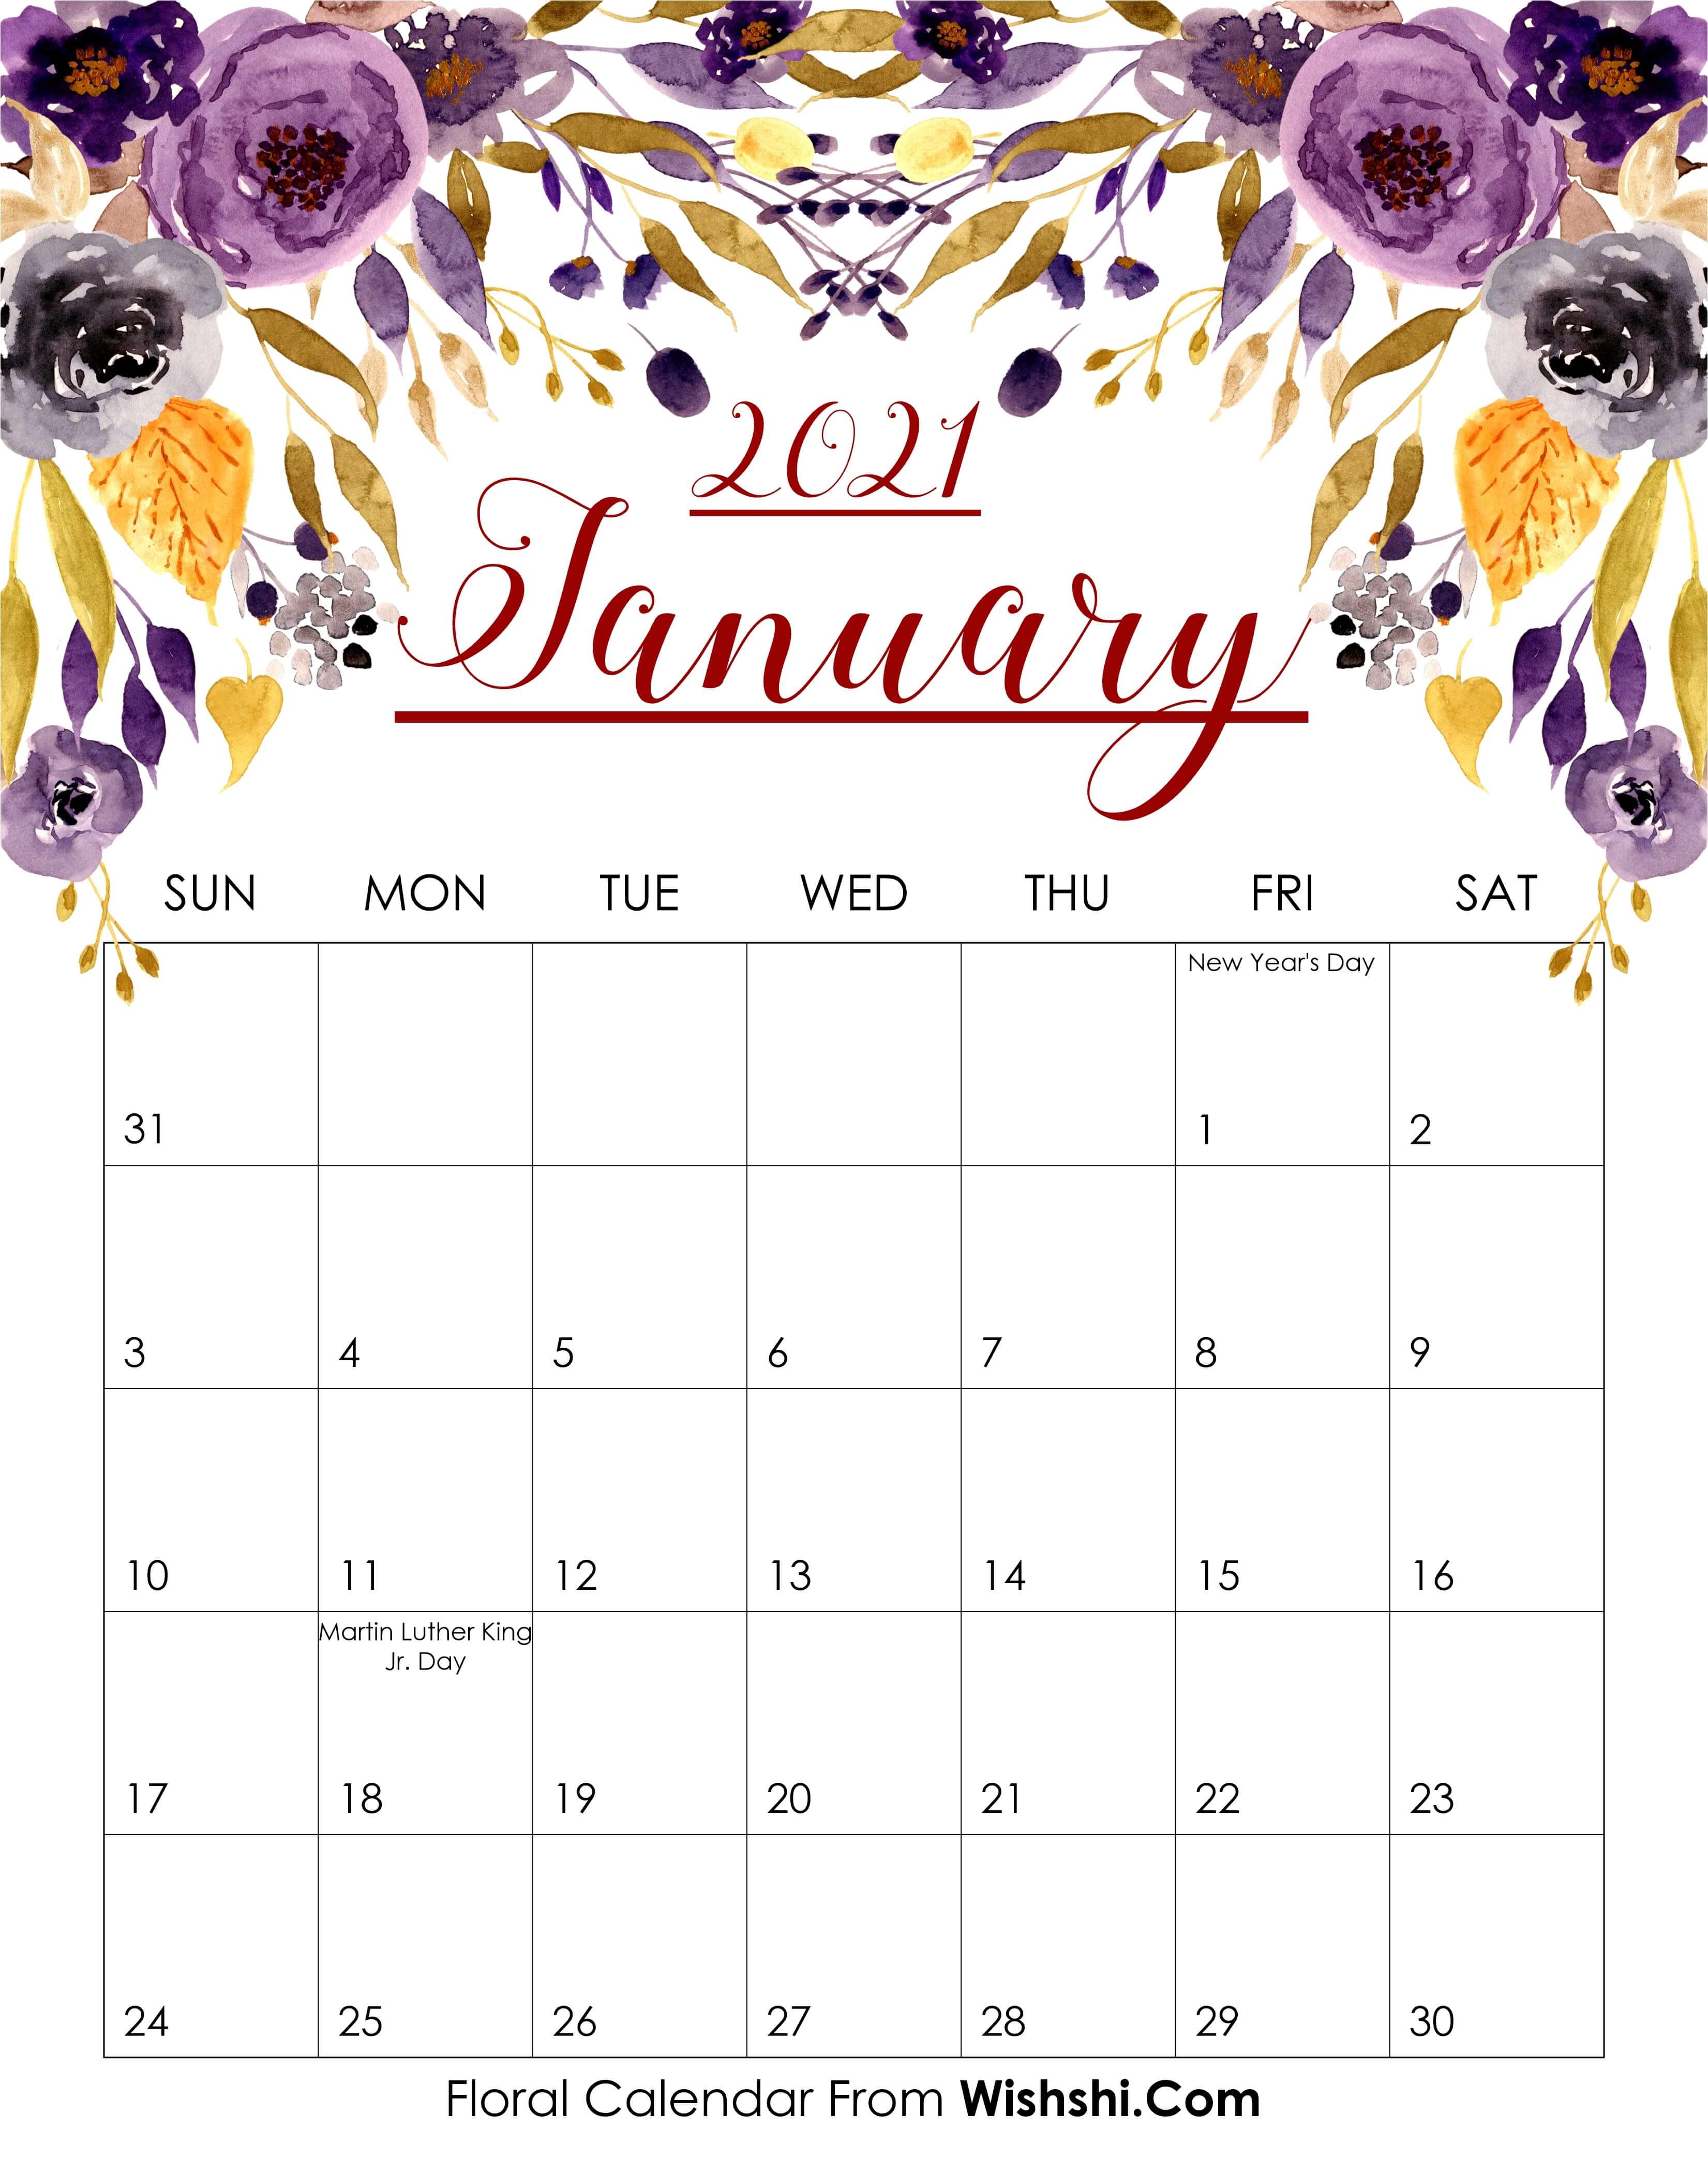 Cute Year 2021 Calendar Wallpapers - Wallpaper Cave